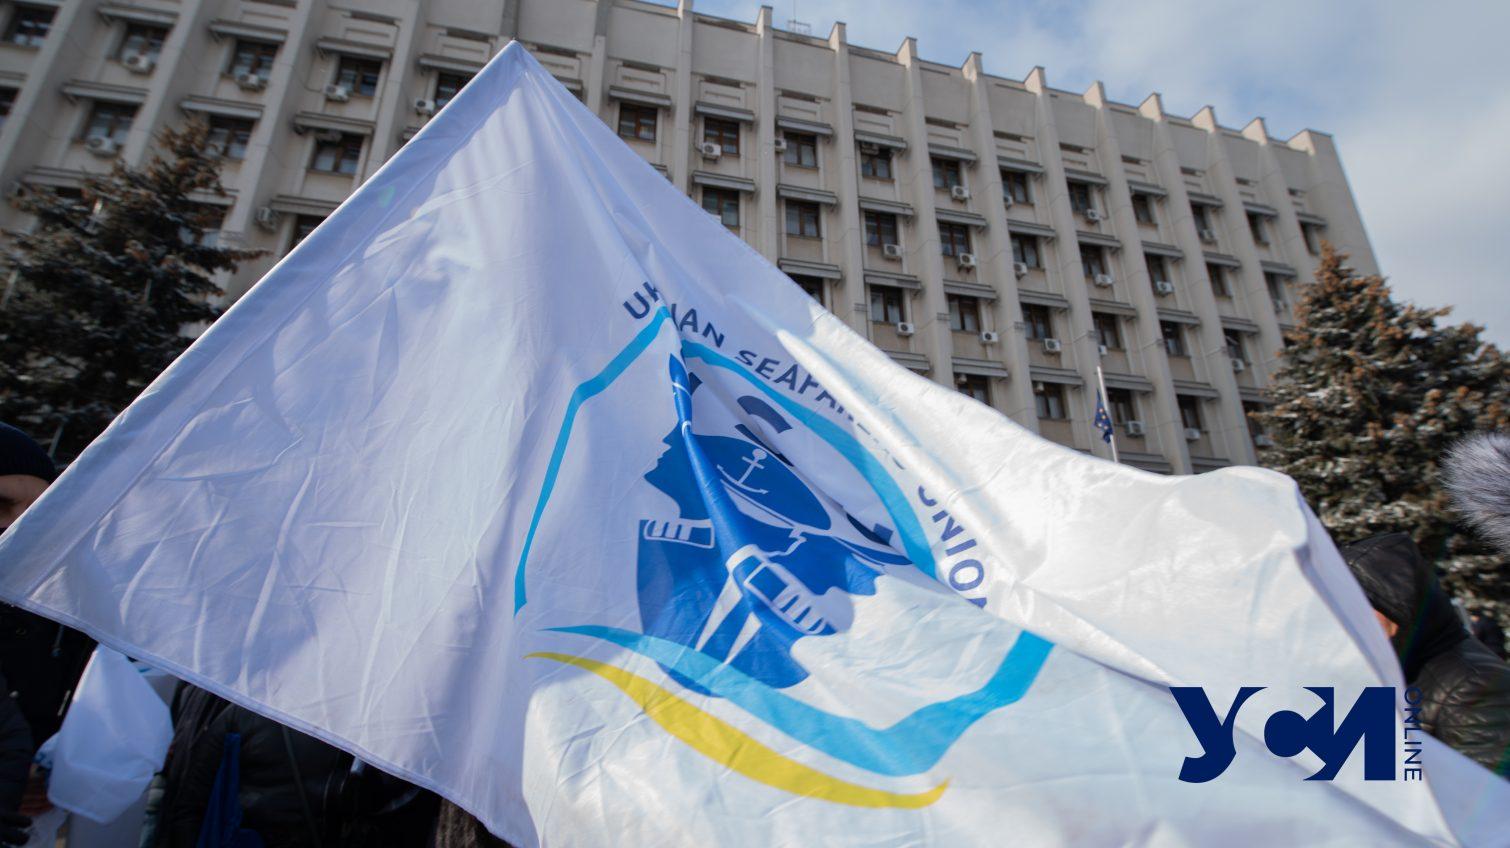 На моряков, вышедших на митинг против коррупции, составили протокол за нарушение карантина (фото, видео, аудио) «фото»